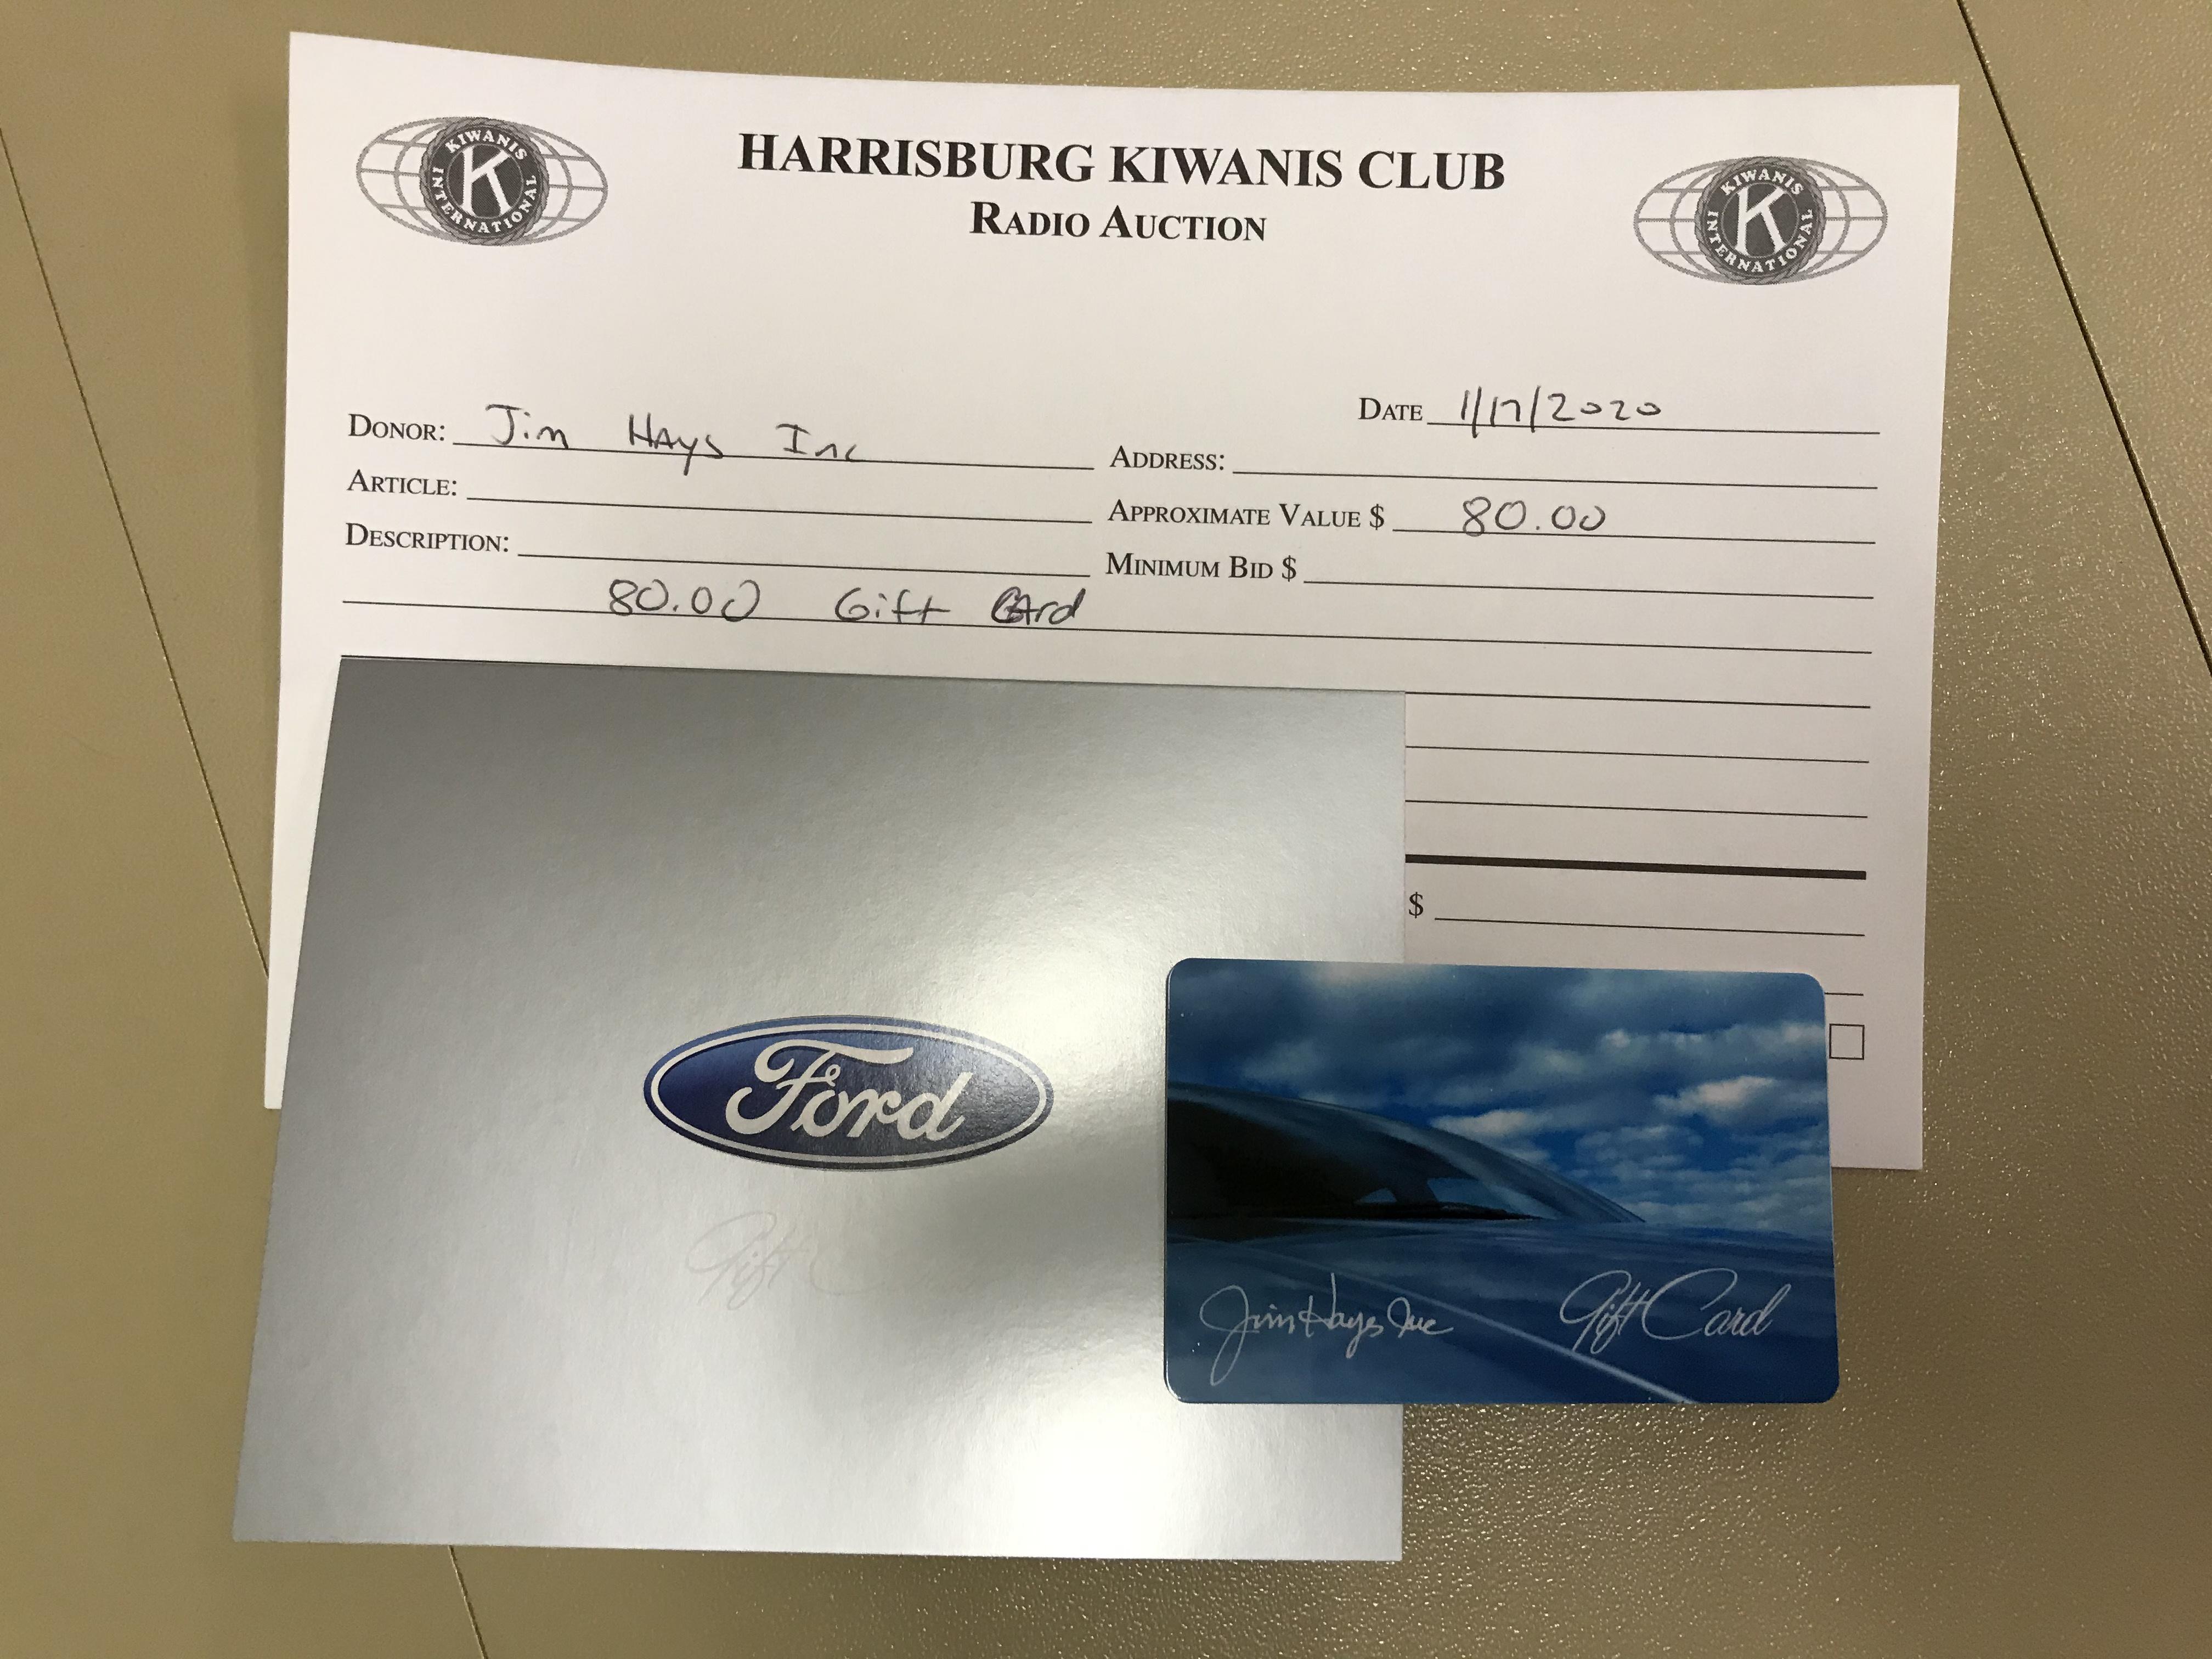 Item 224 - Jim Hayes, Inc. $80 Gift Card